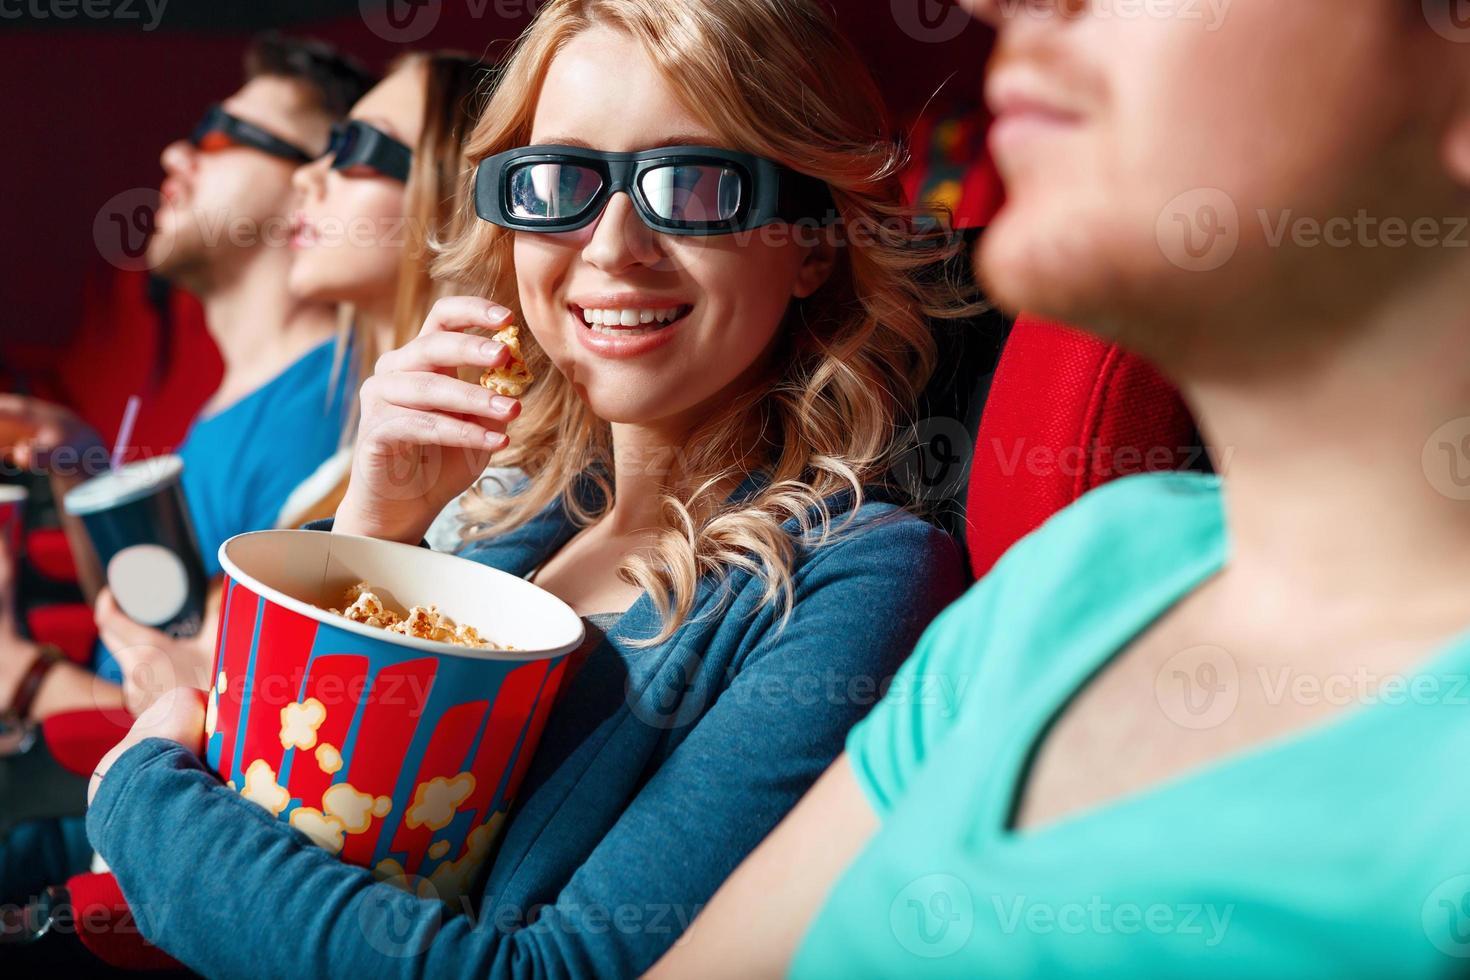 donna in 3 bicchieri d mangiare popcorn foto